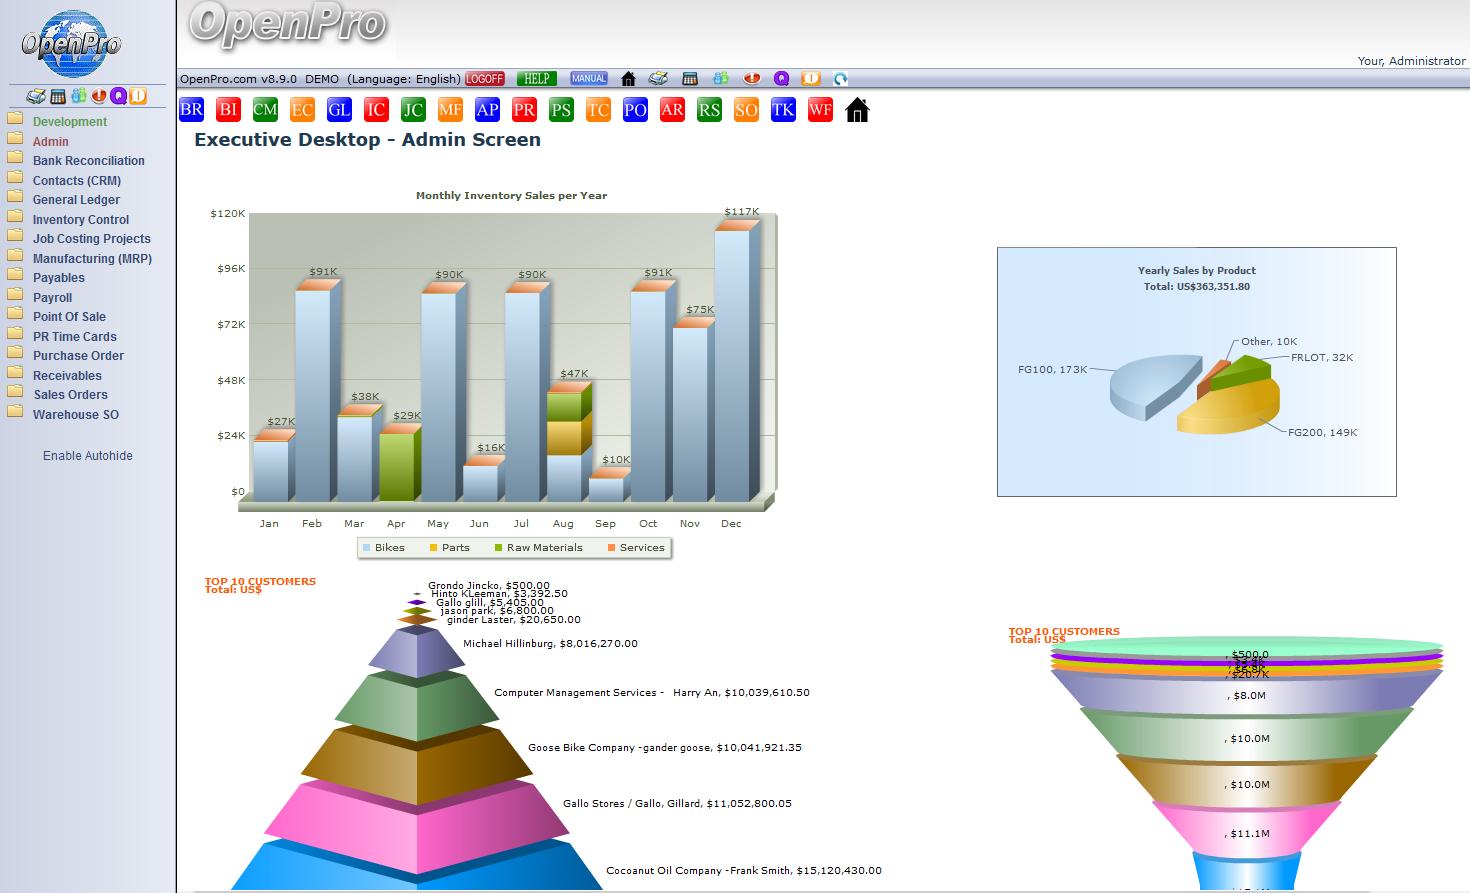 OpenPro ERP Demo - OpenPro Main Menu screen